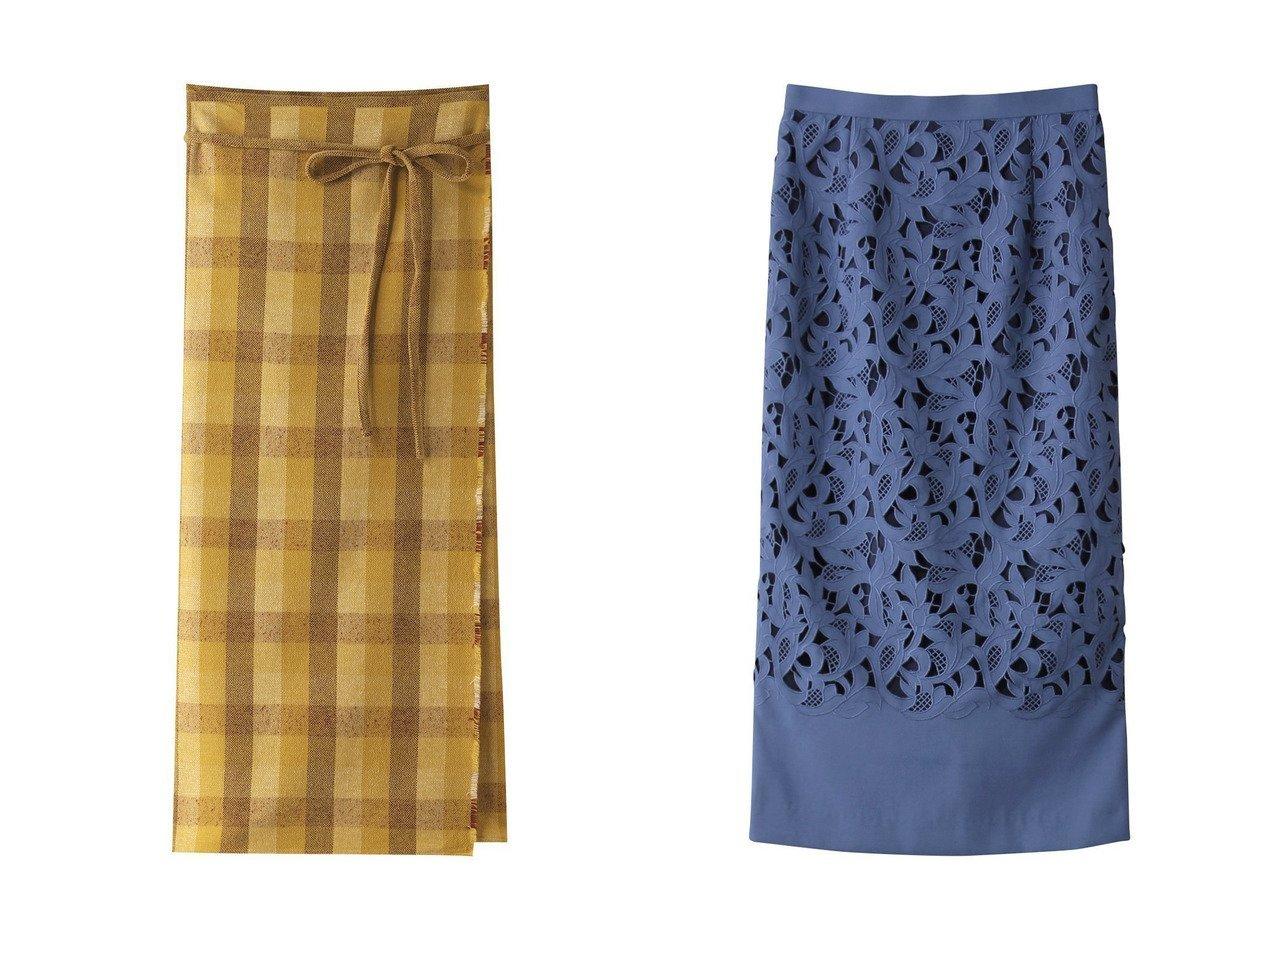 【allureville/アルアバイル】のエンブロイダリータイトスカート&【POSTELEGANT/ポステレガント】のウールコットンチェックラップスカート 【スカート】おすすめ!人気、トレンド・レディースファッションの通販 おすすめで人気の流行・トレンド、ファッションの通販商品 インテリア・家具・メンズファッション・キッズファッション・レディースファッション・服の通販 founy(ファニー) https://founy.com/ ファッション Fashion レディースファッション WOMEN スカート Skirt ロングスカート Long Skirt スリム チェック ブランケット マキシ リラックス ロング |ID:crp329100000069144